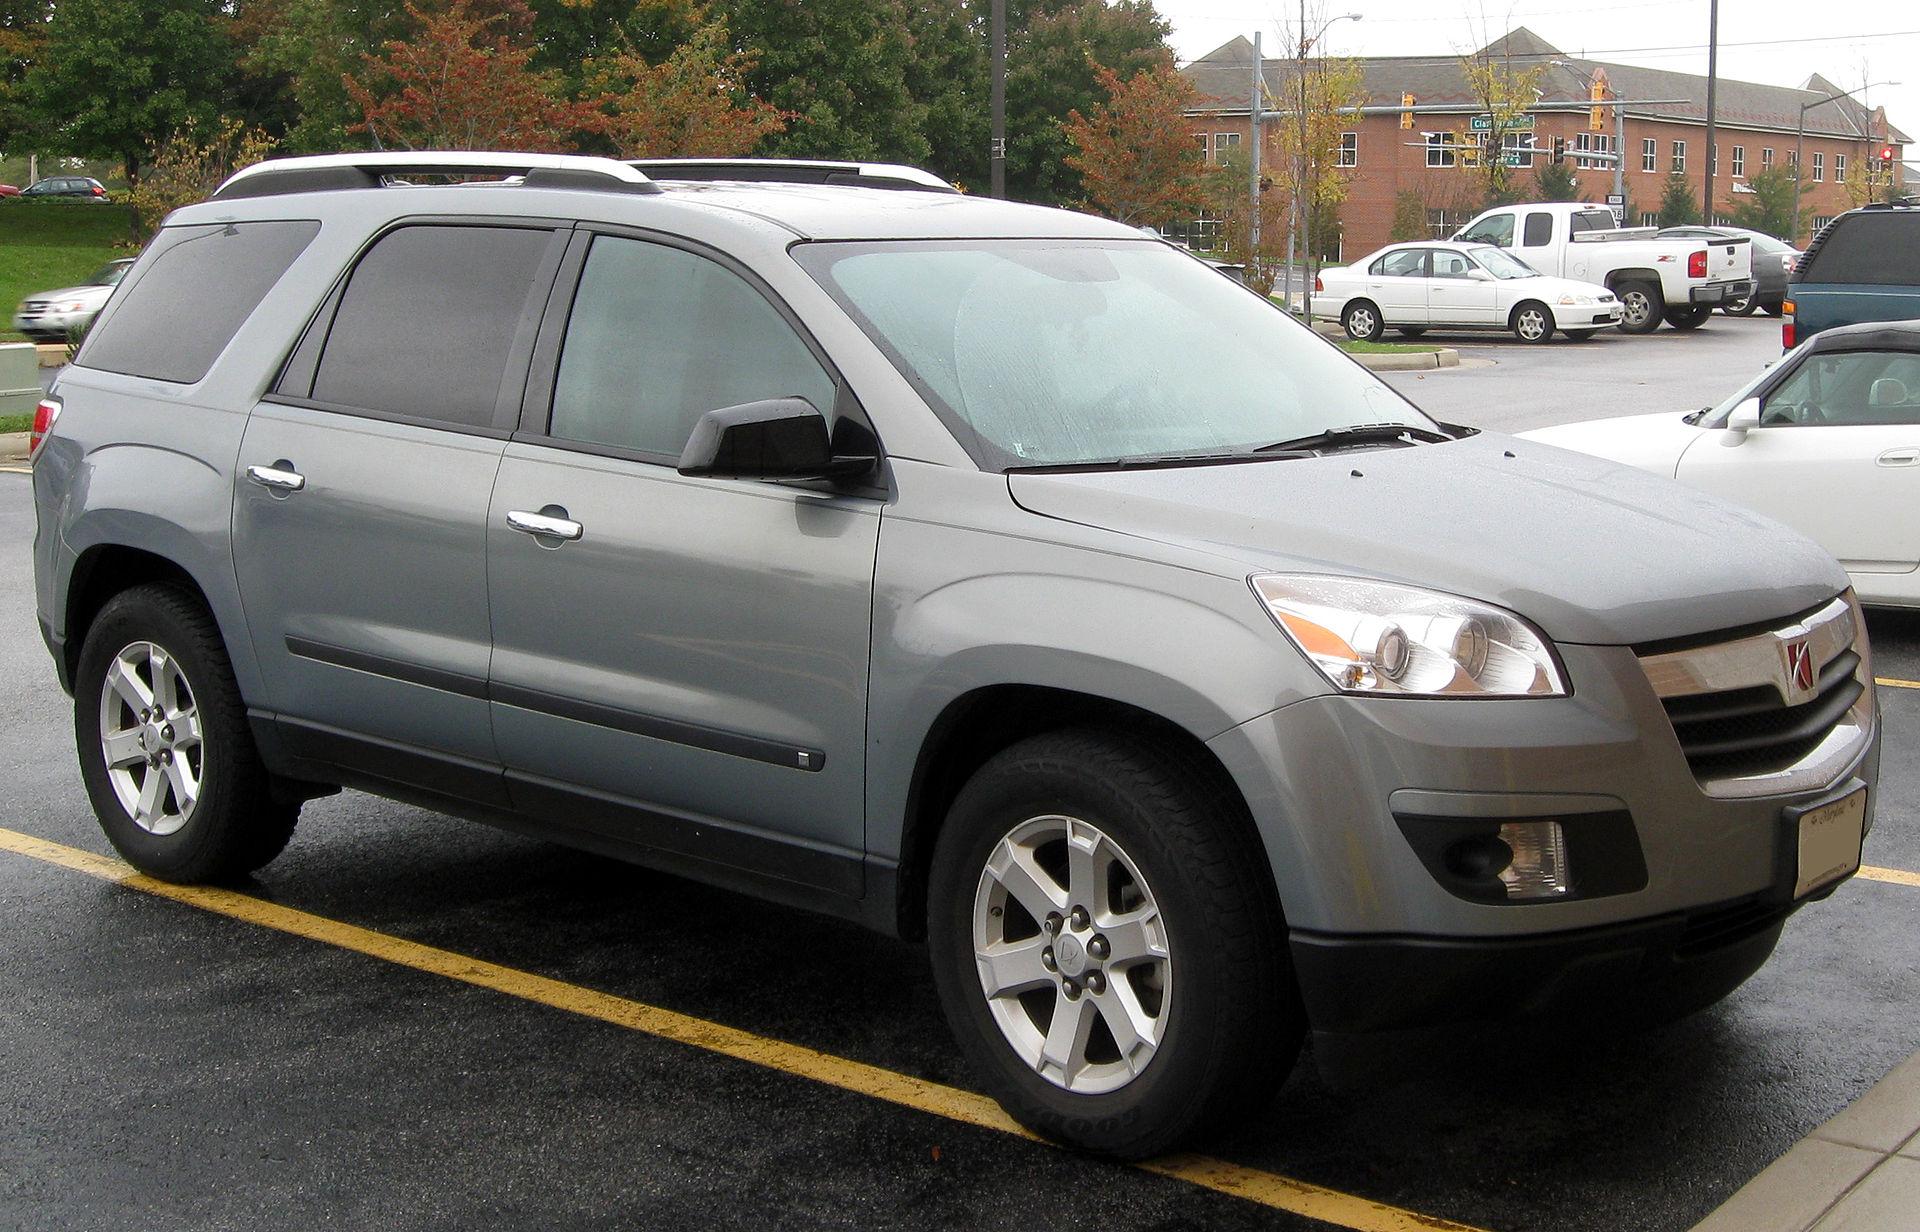 17 Best Used SUVs under $10,000 - Page 10 of 17 - Carophile